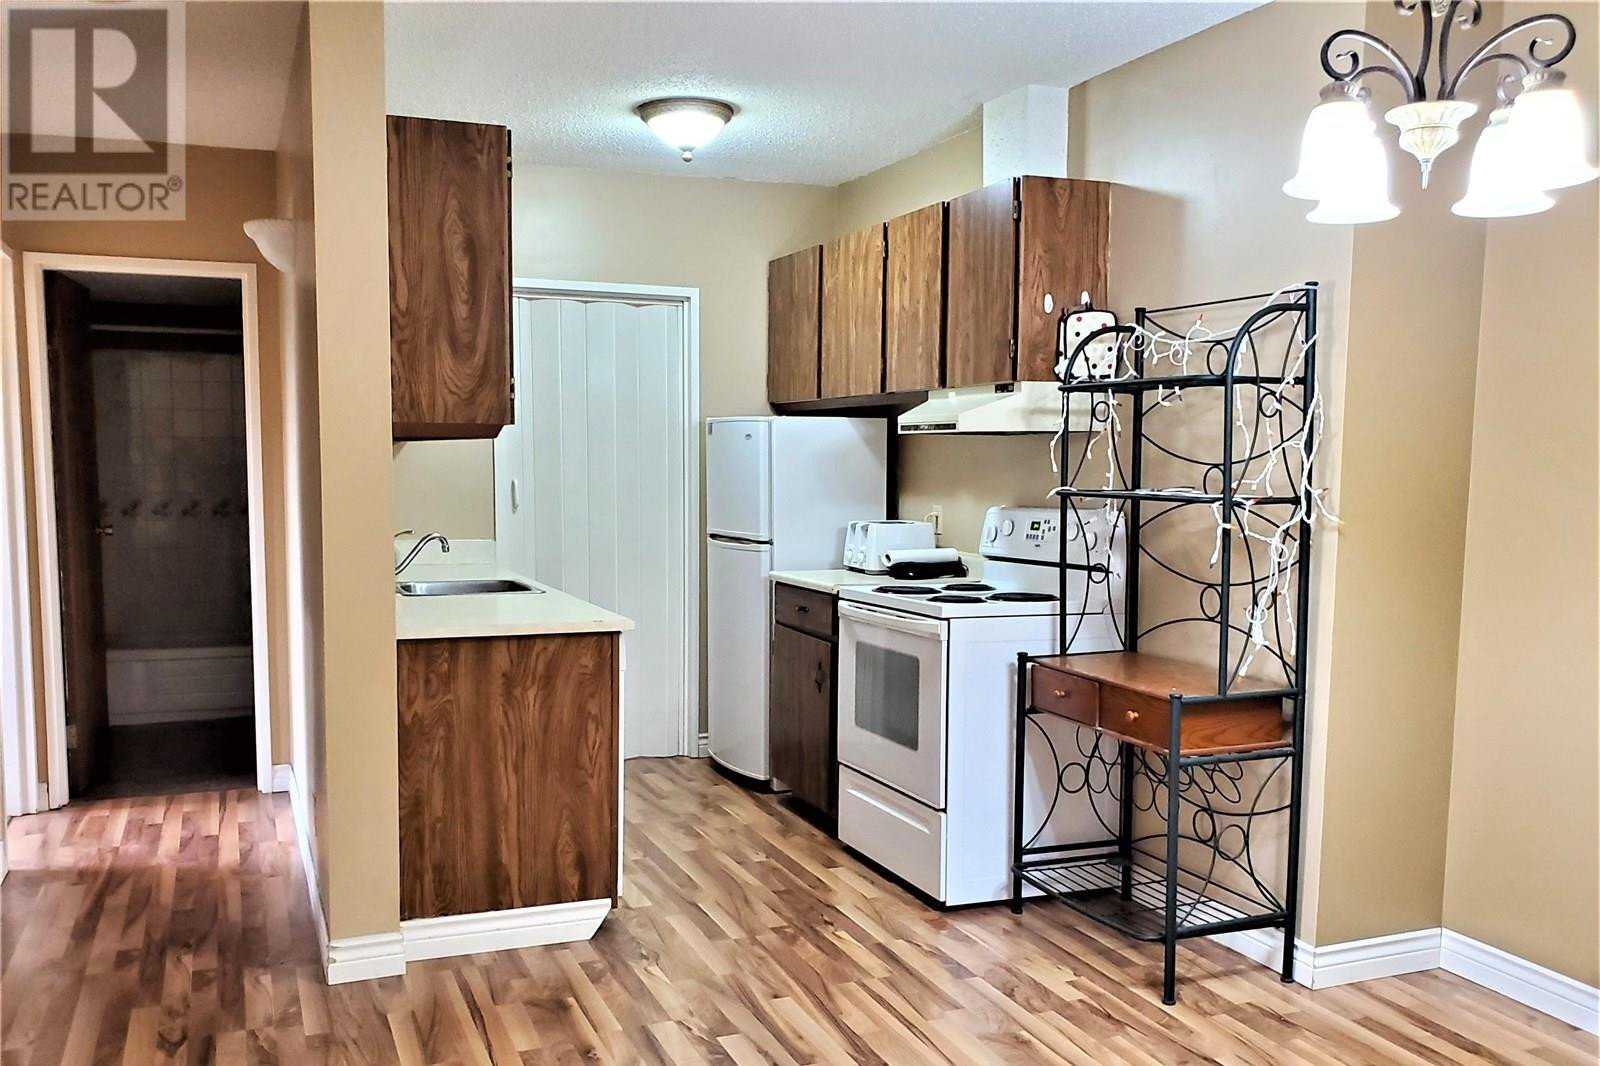 Condo for sale at 419 Tait Ct Unit 307 Saskatoon Saskatchewan - MLS: SK833741